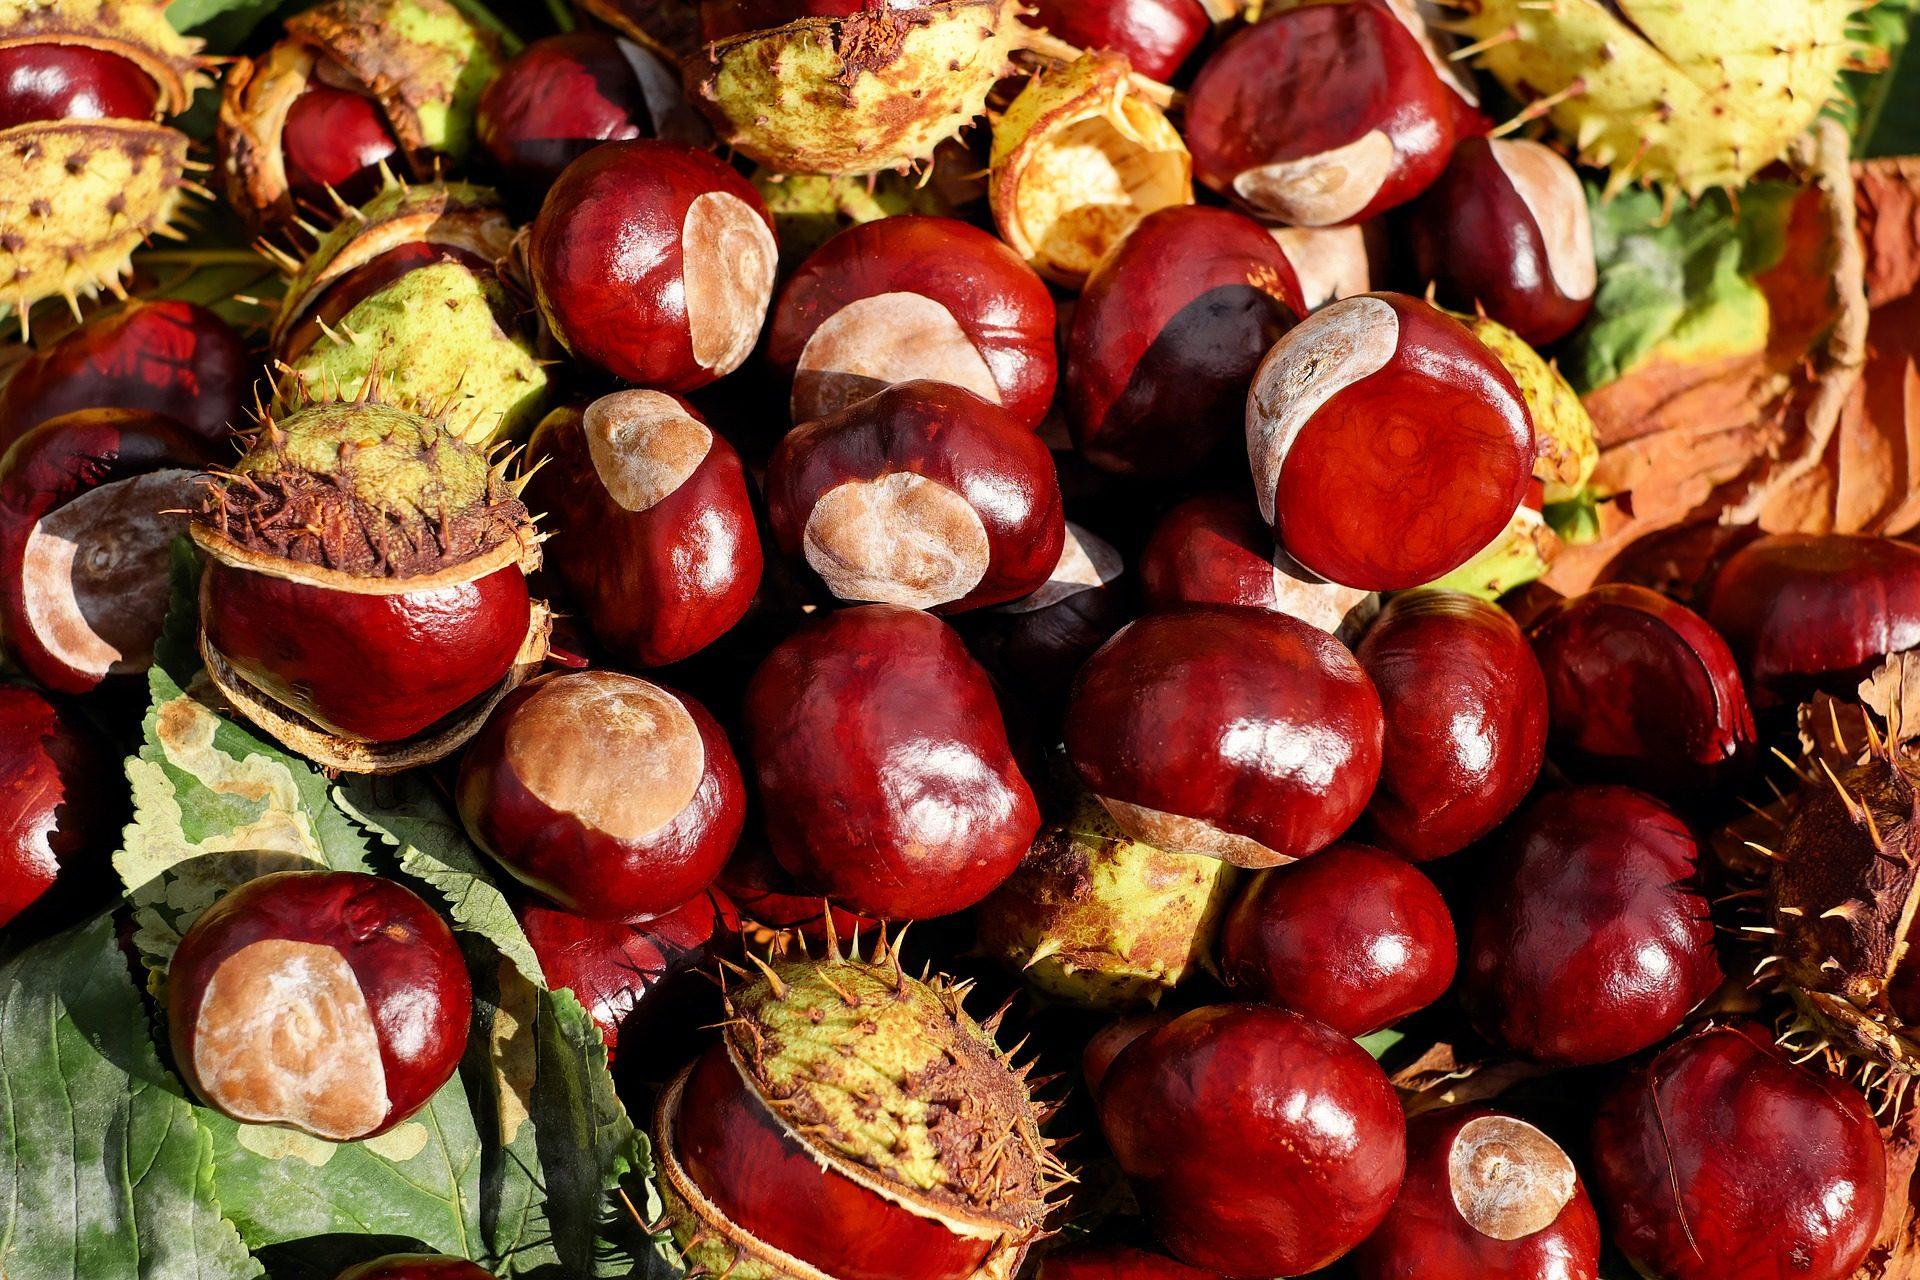 castañas, frutos, brillante, cáscaras, otoño - Fondos de Pantalla HD - professor-falken.com